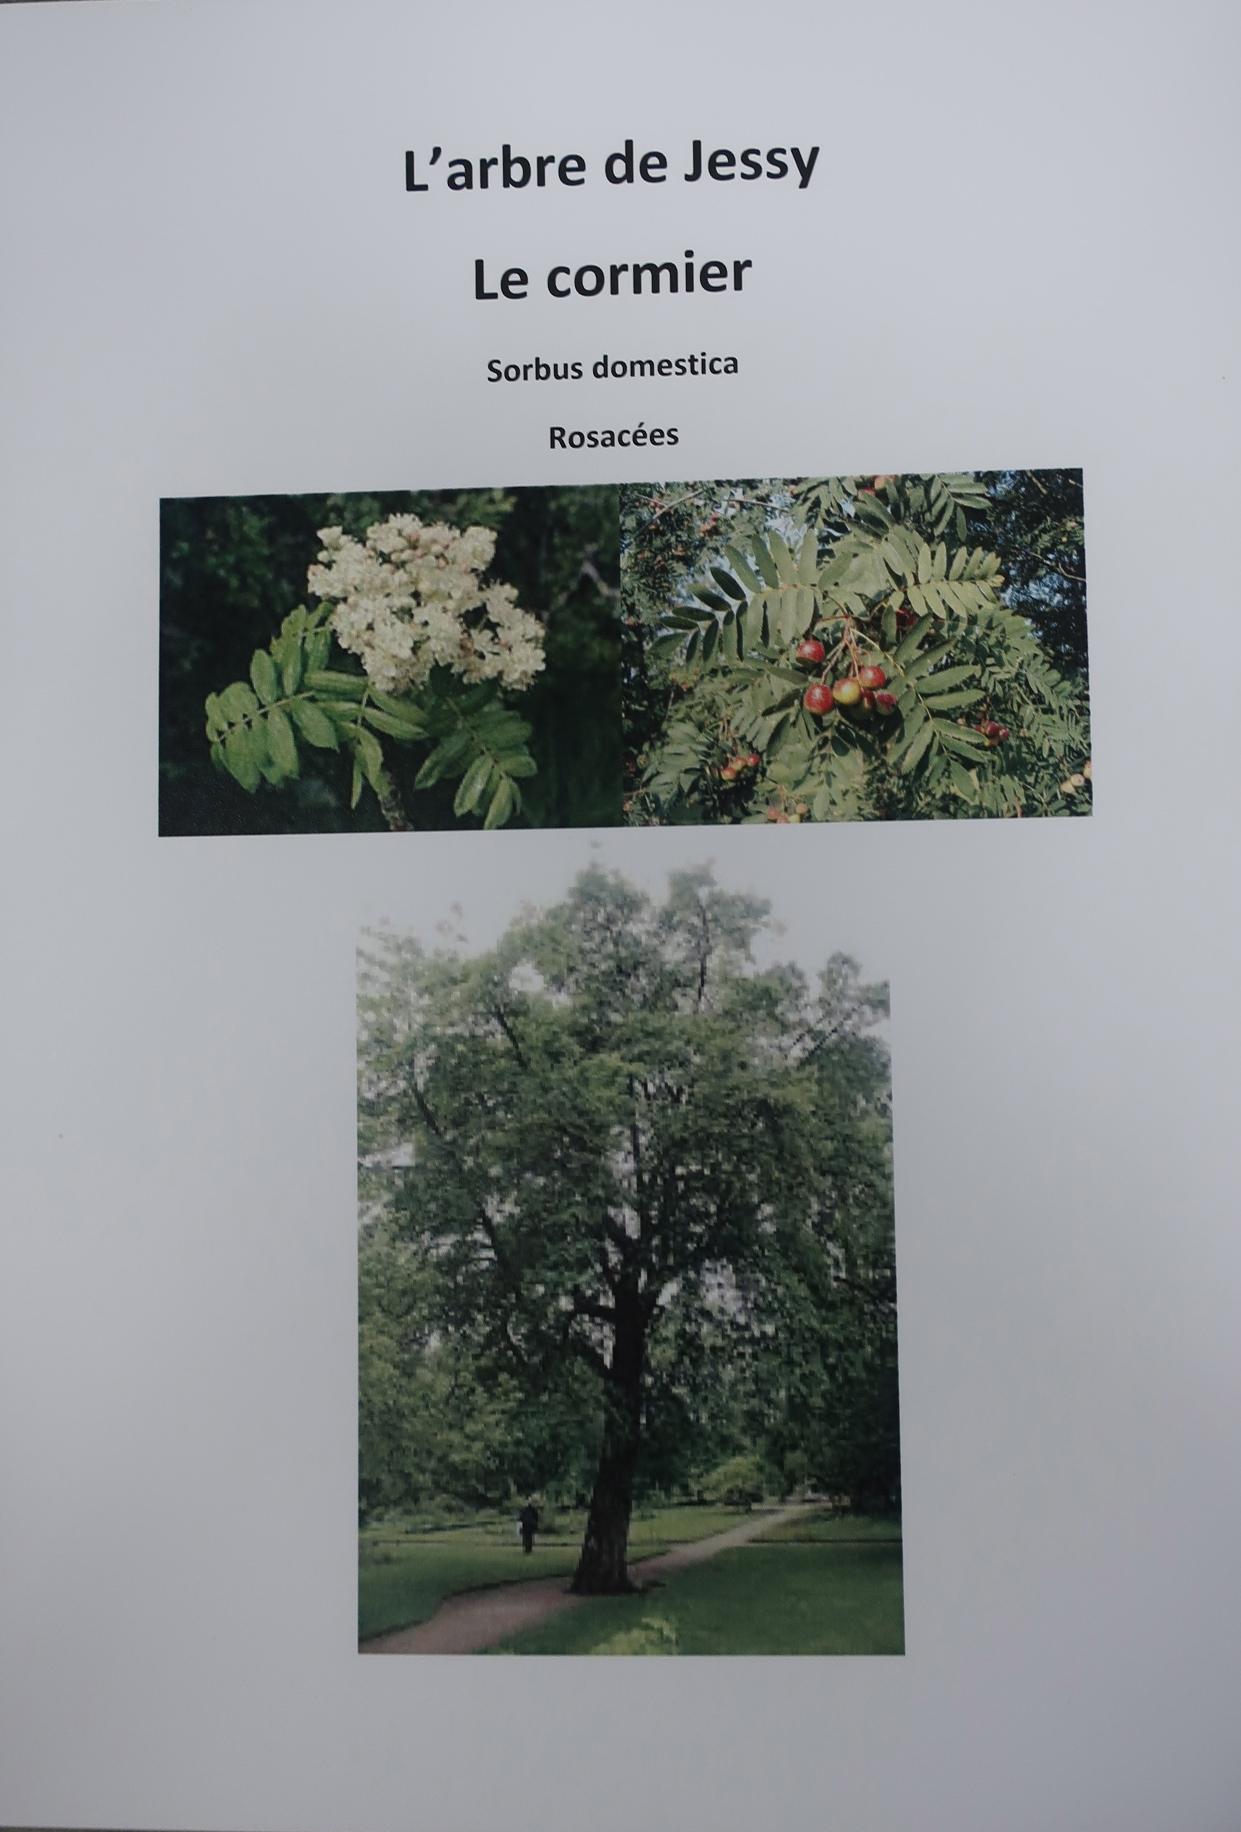 Inauguration des arbres Jessy, Constance, Gabriel